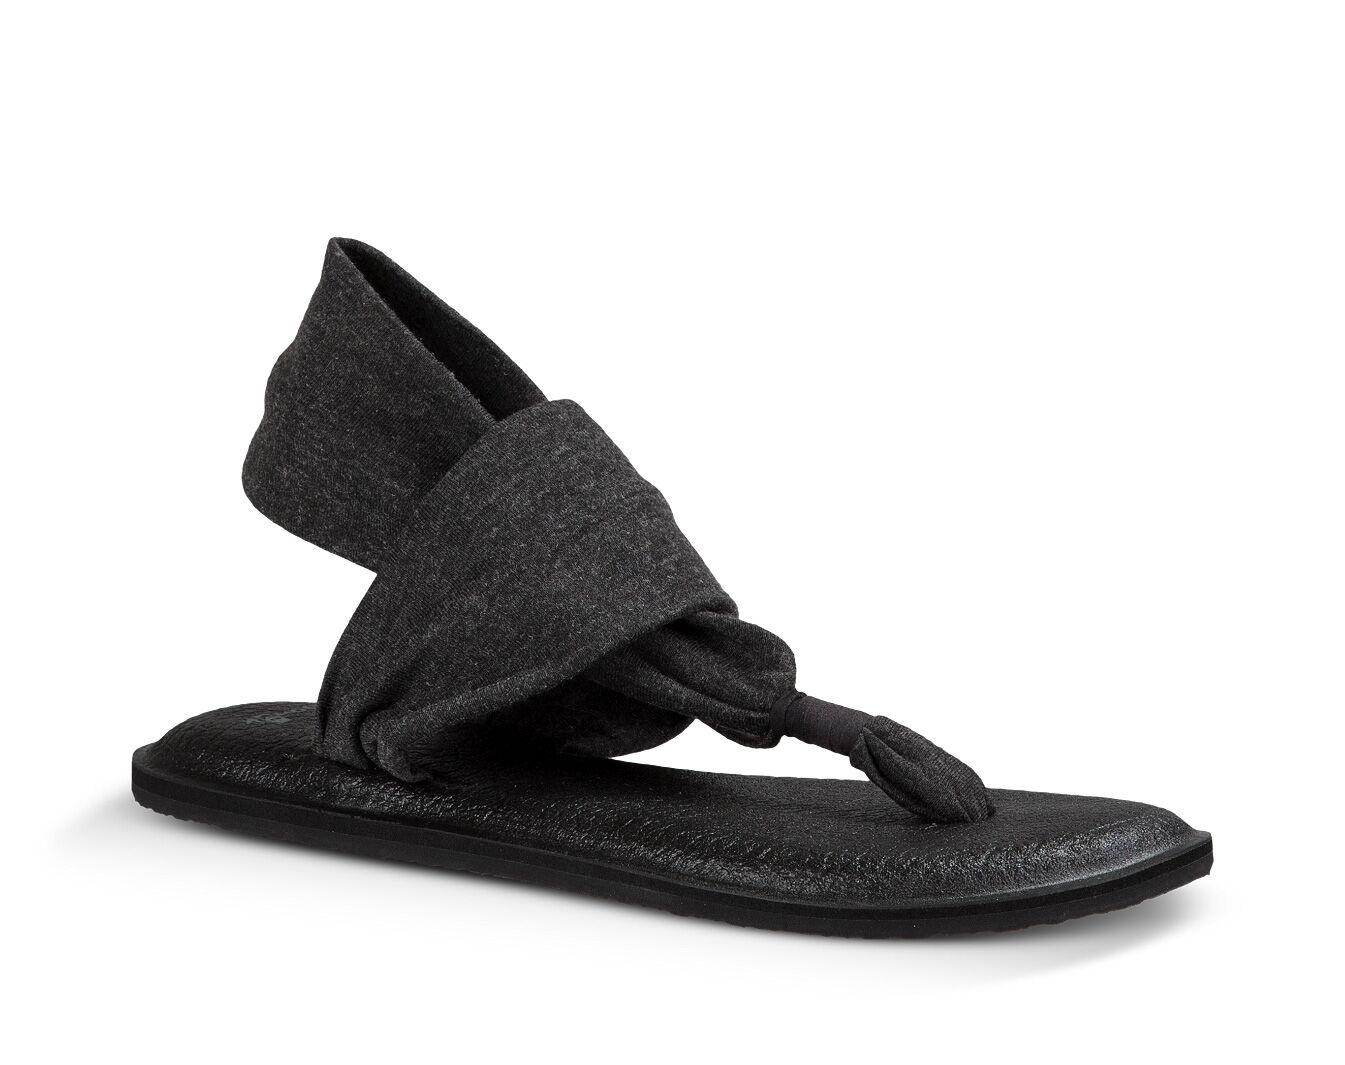 Sanuk Yoga Bliss Shoes Women Ivory Größe 36 2016 Sandalen srVsABOym